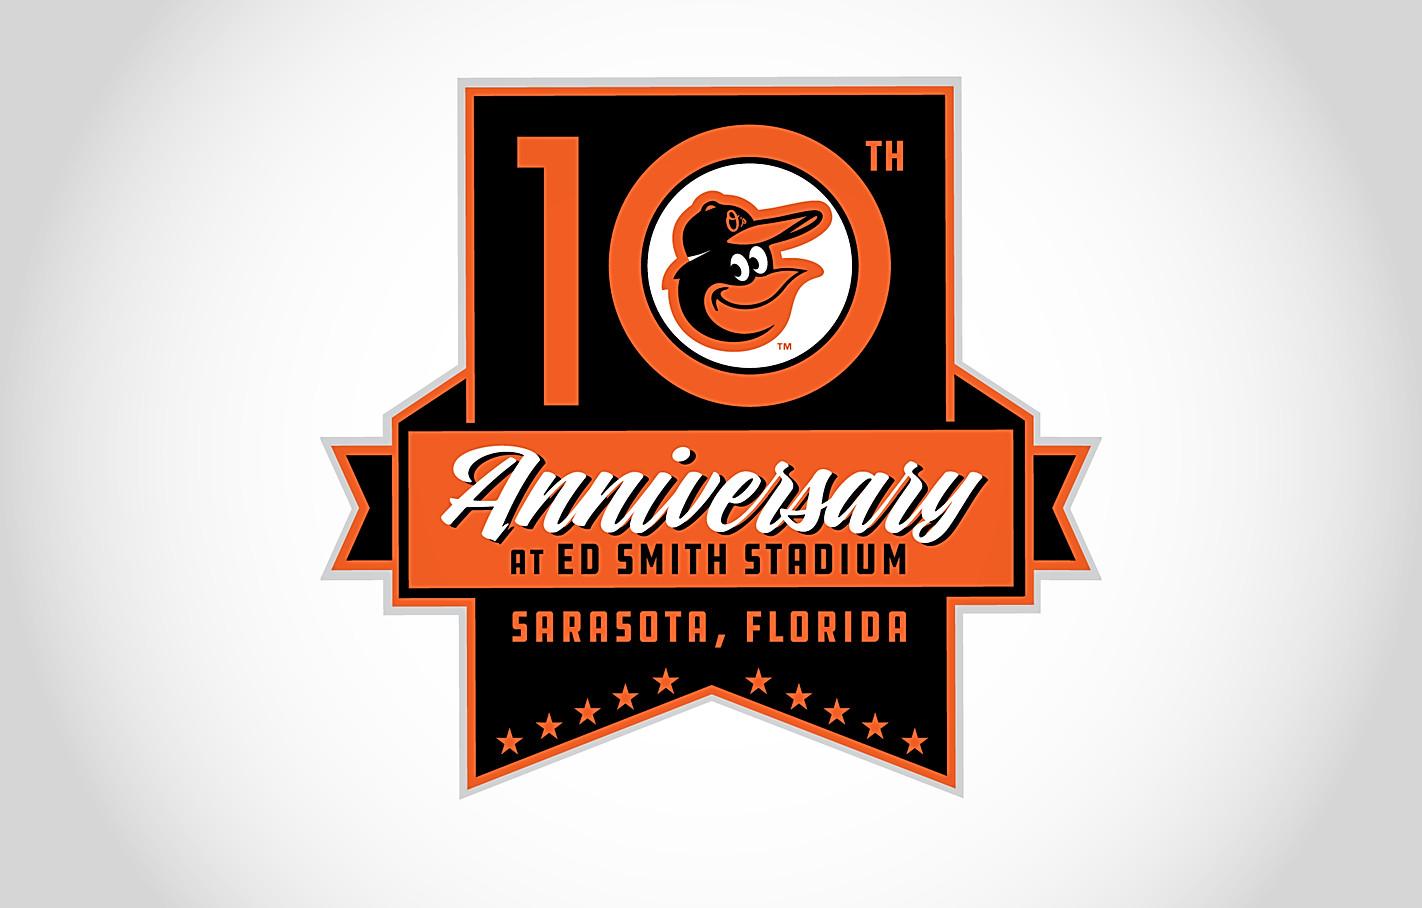 Orioles 10th Anniversary Sarasota Logo